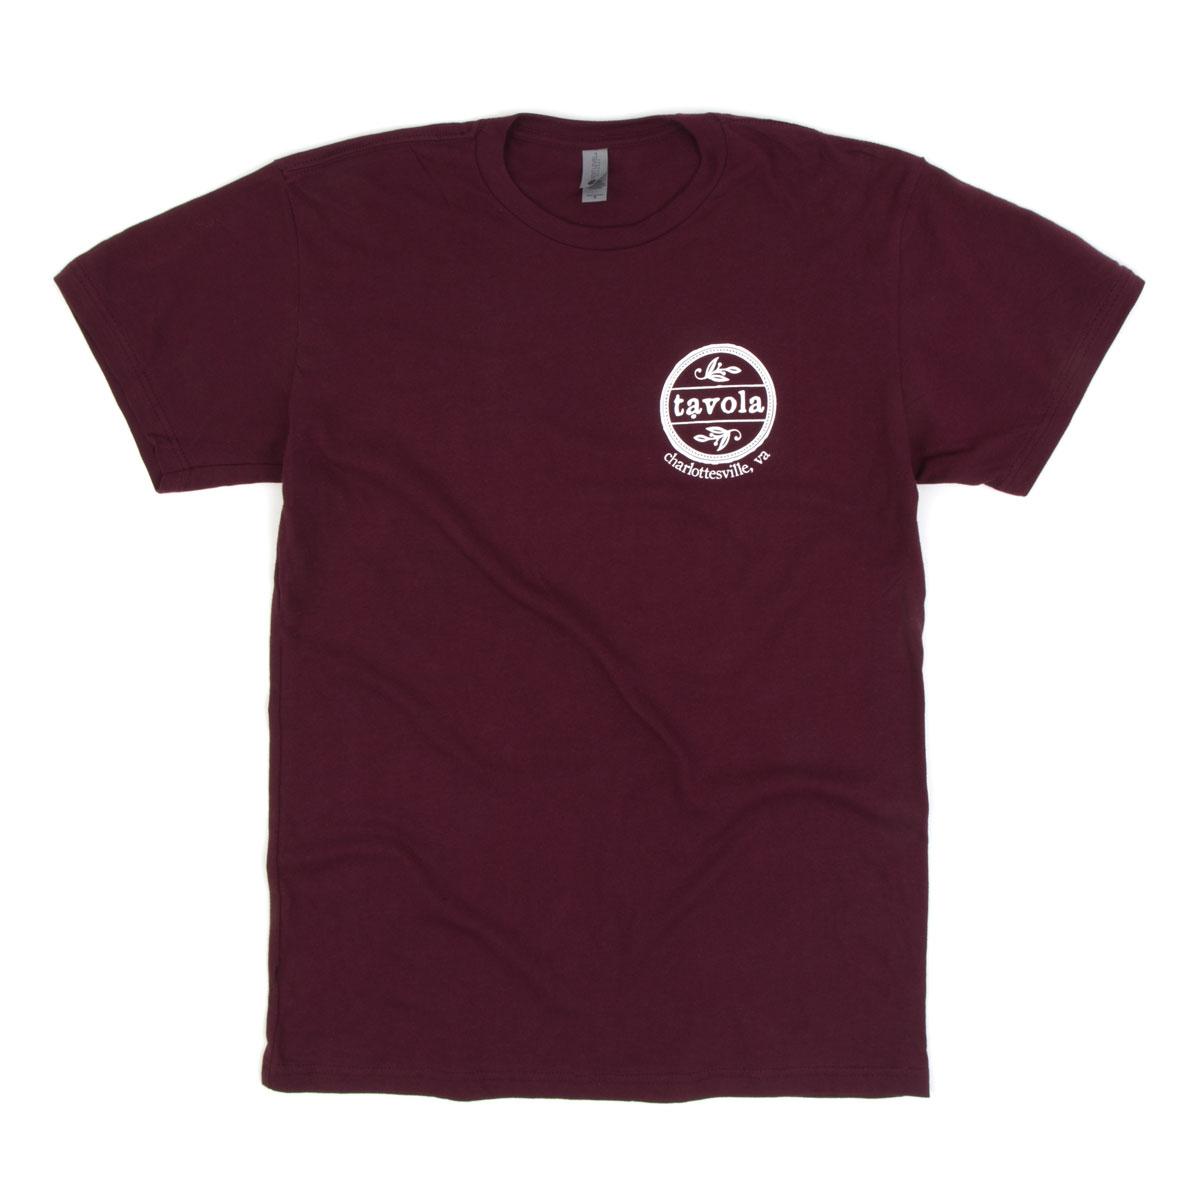 tavola Next Level Short Sleeve T-shirt